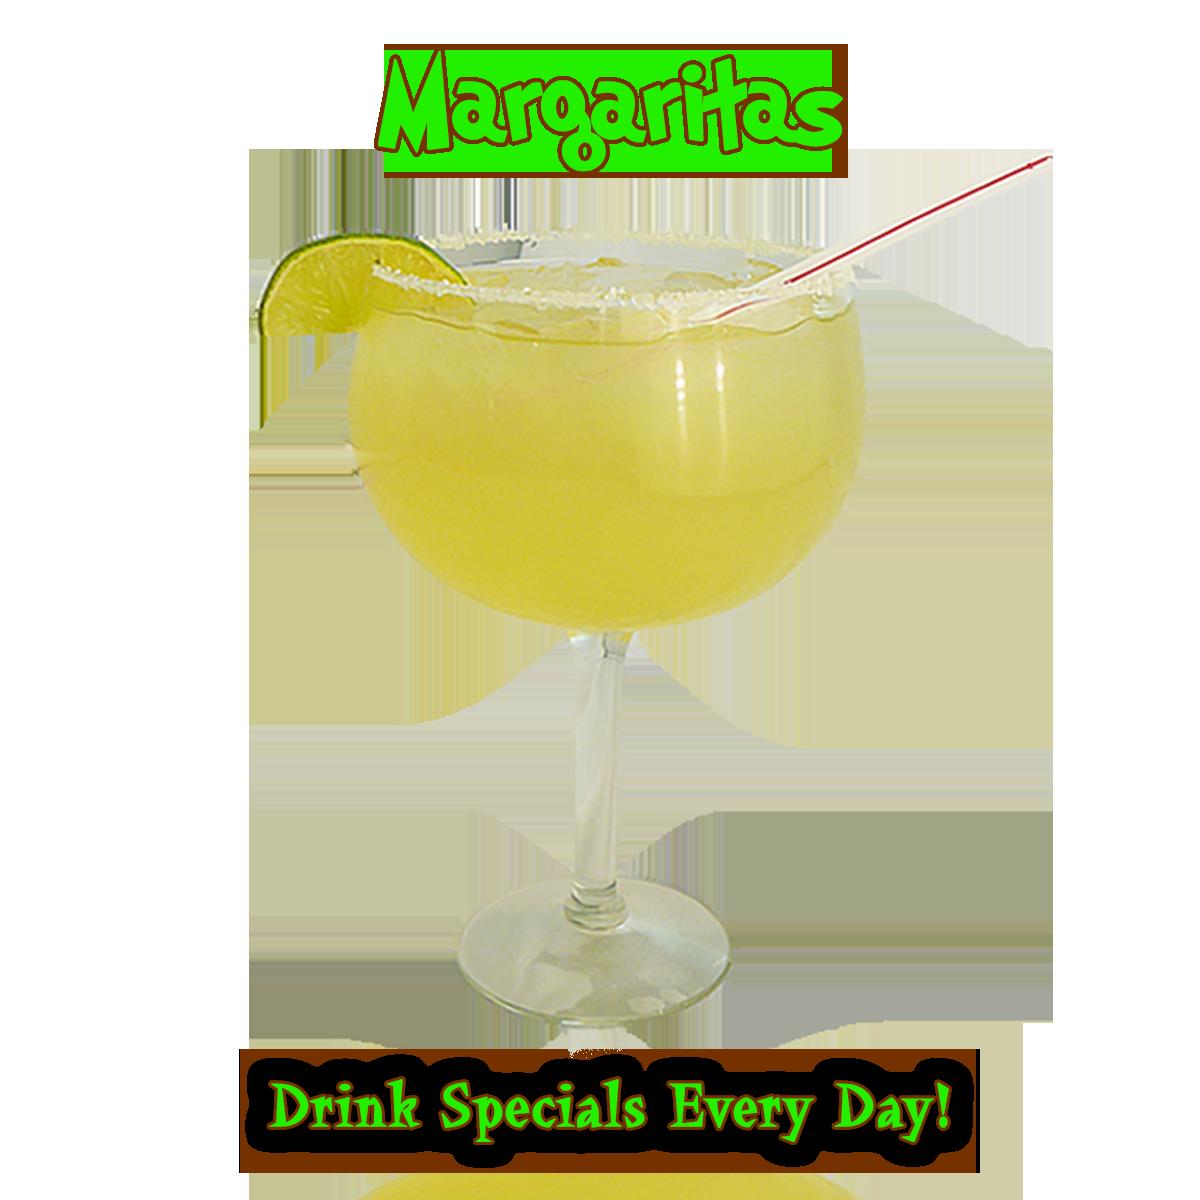 Margarita stock vector. Illustration of mexica, lime - 13891937